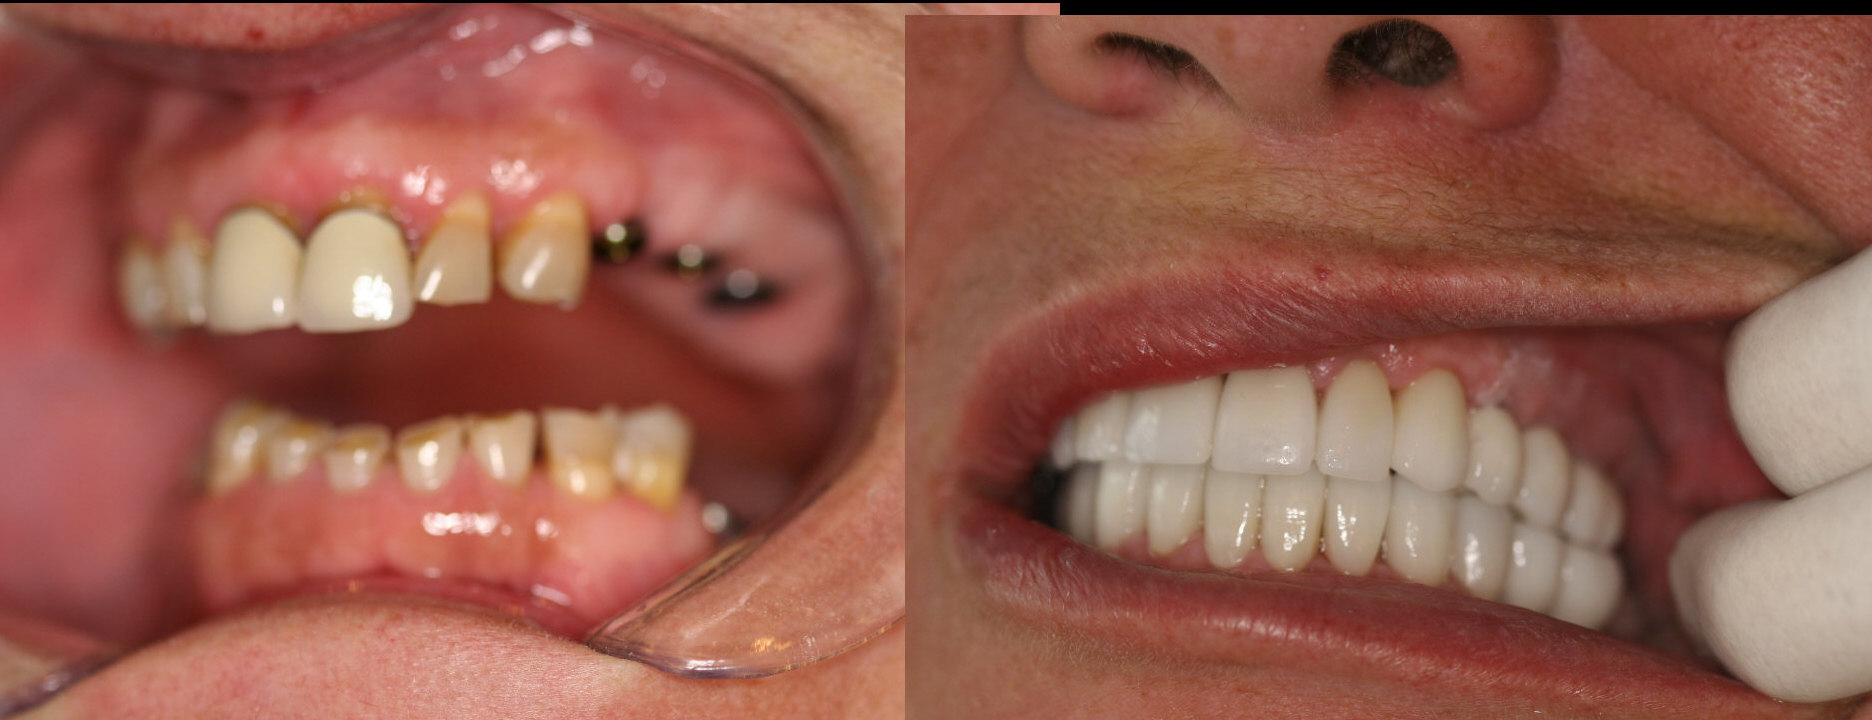 Mouth Dental 12